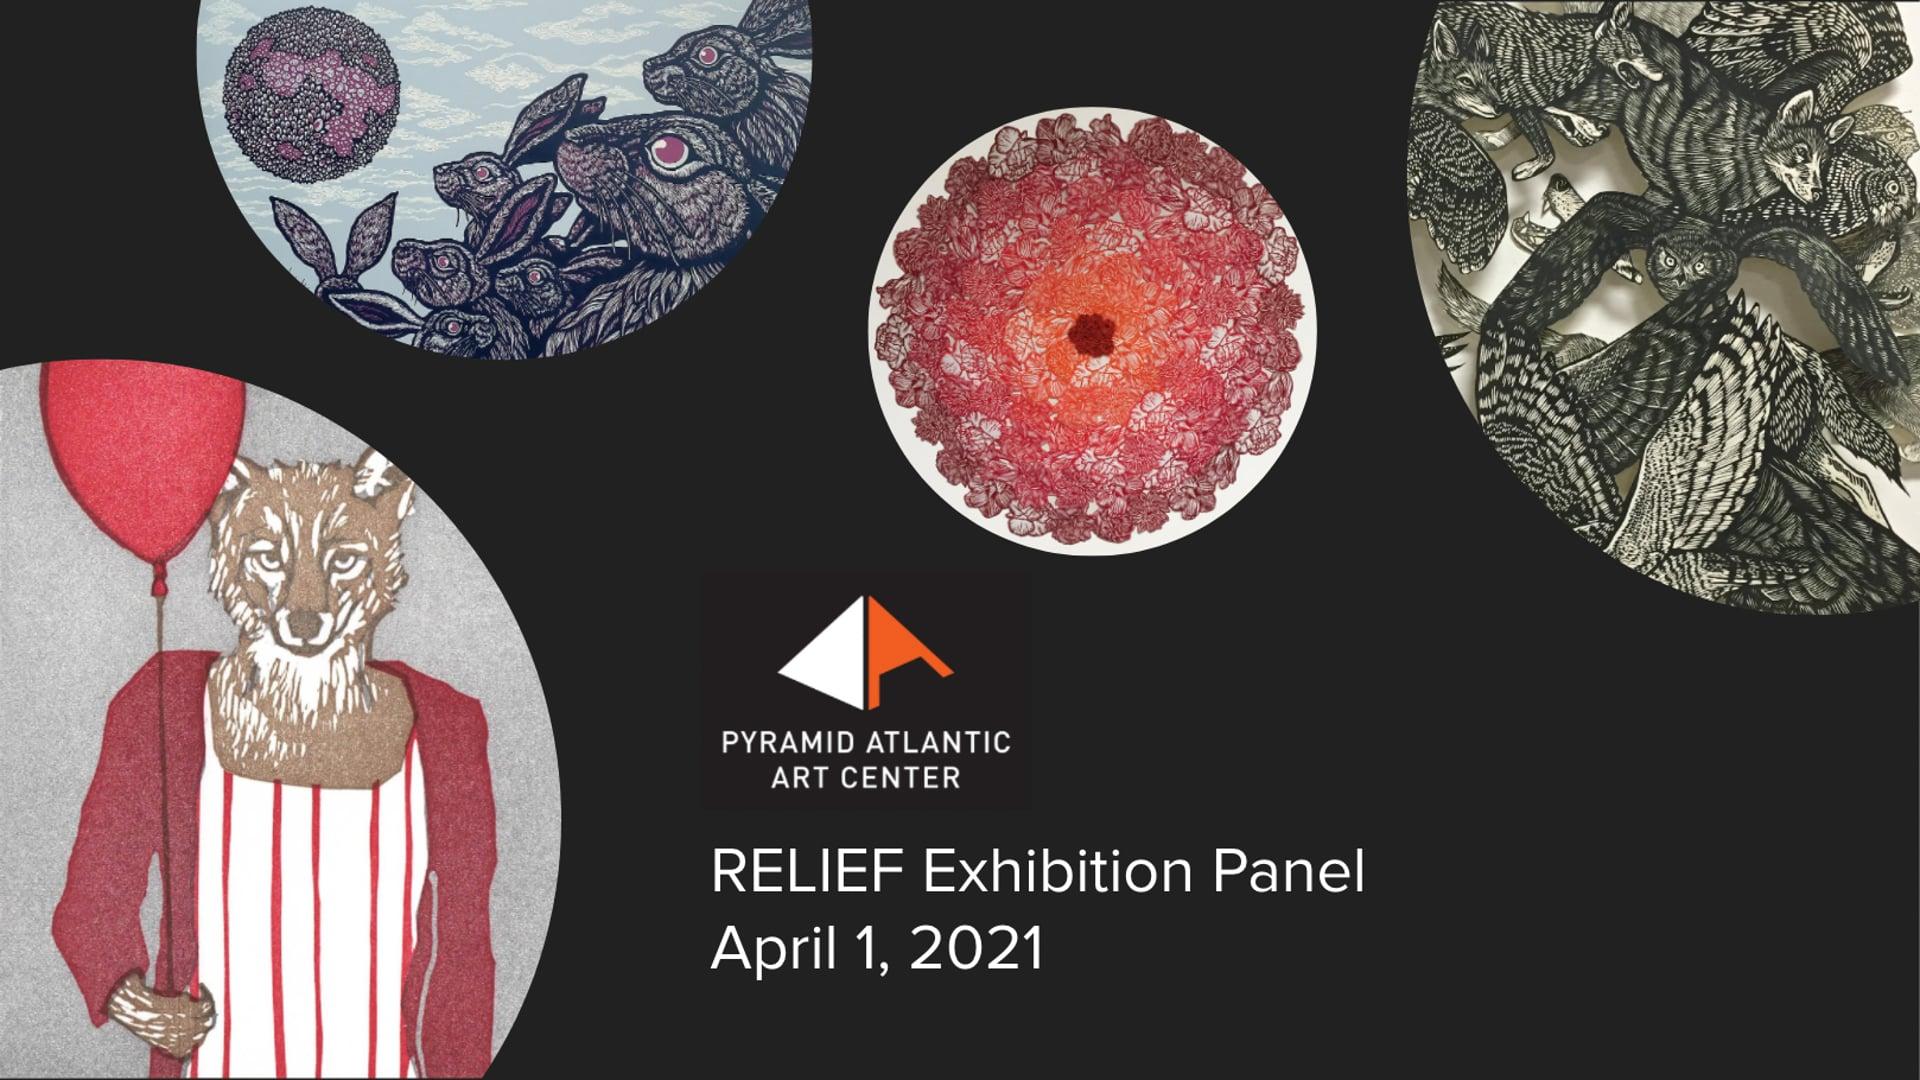 RELIEF Exhibition Panel